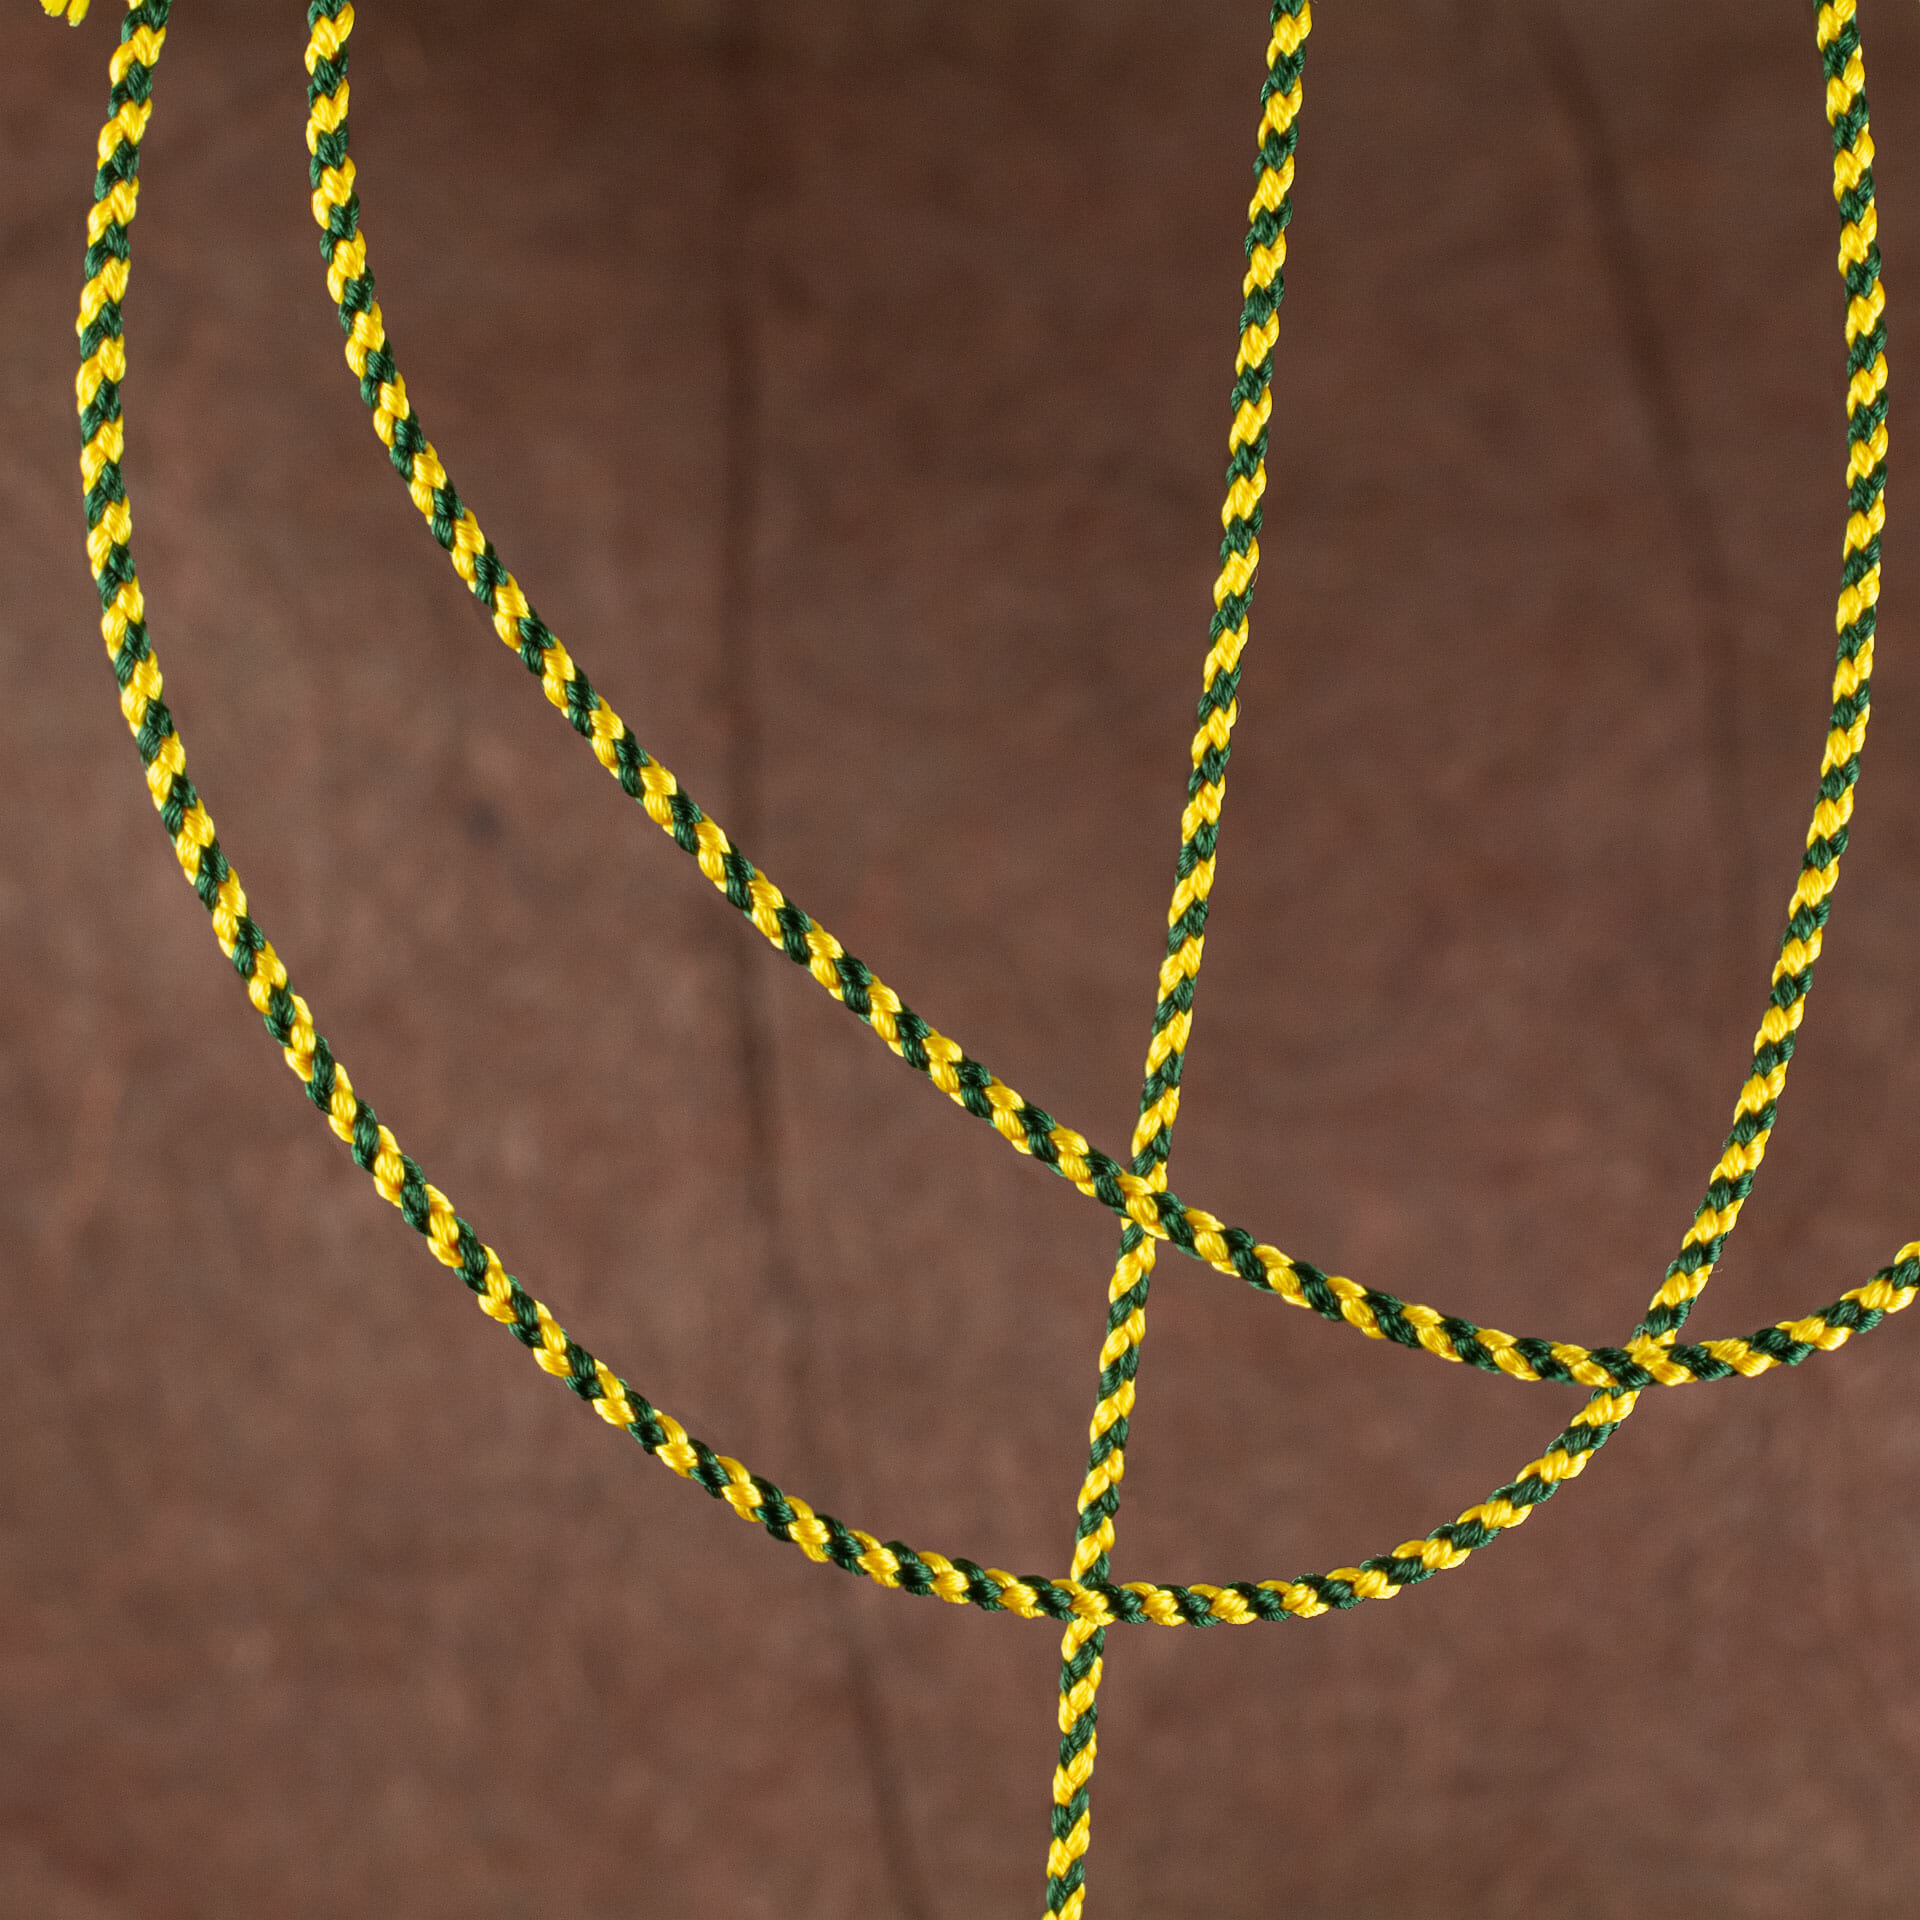 Yellow and green kumihimo braid